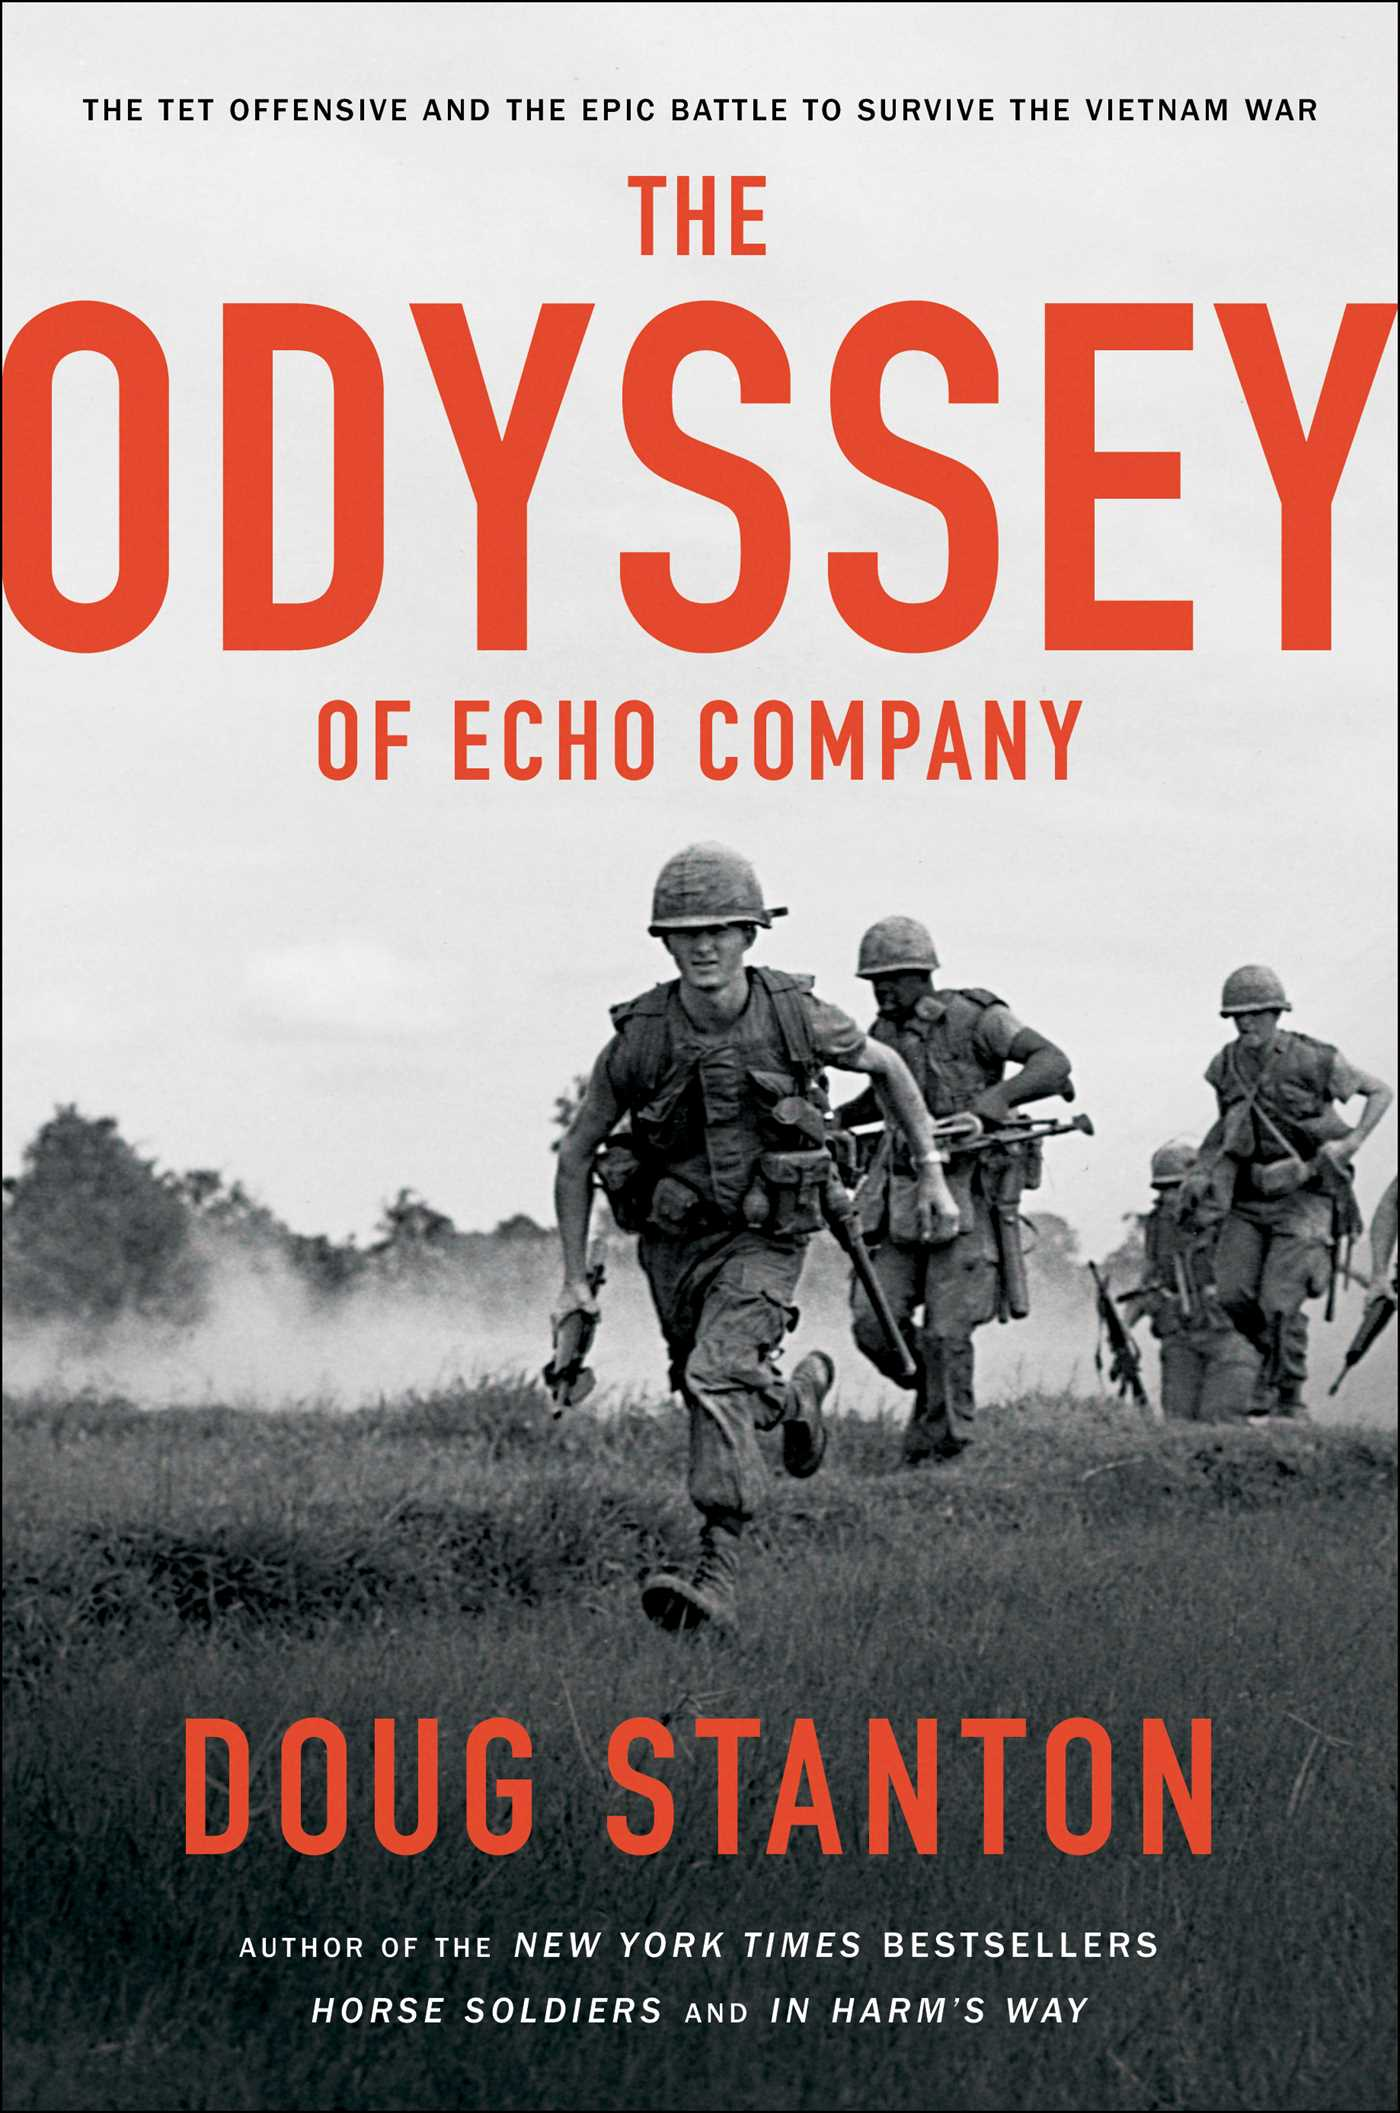 Battles of The Vietnam